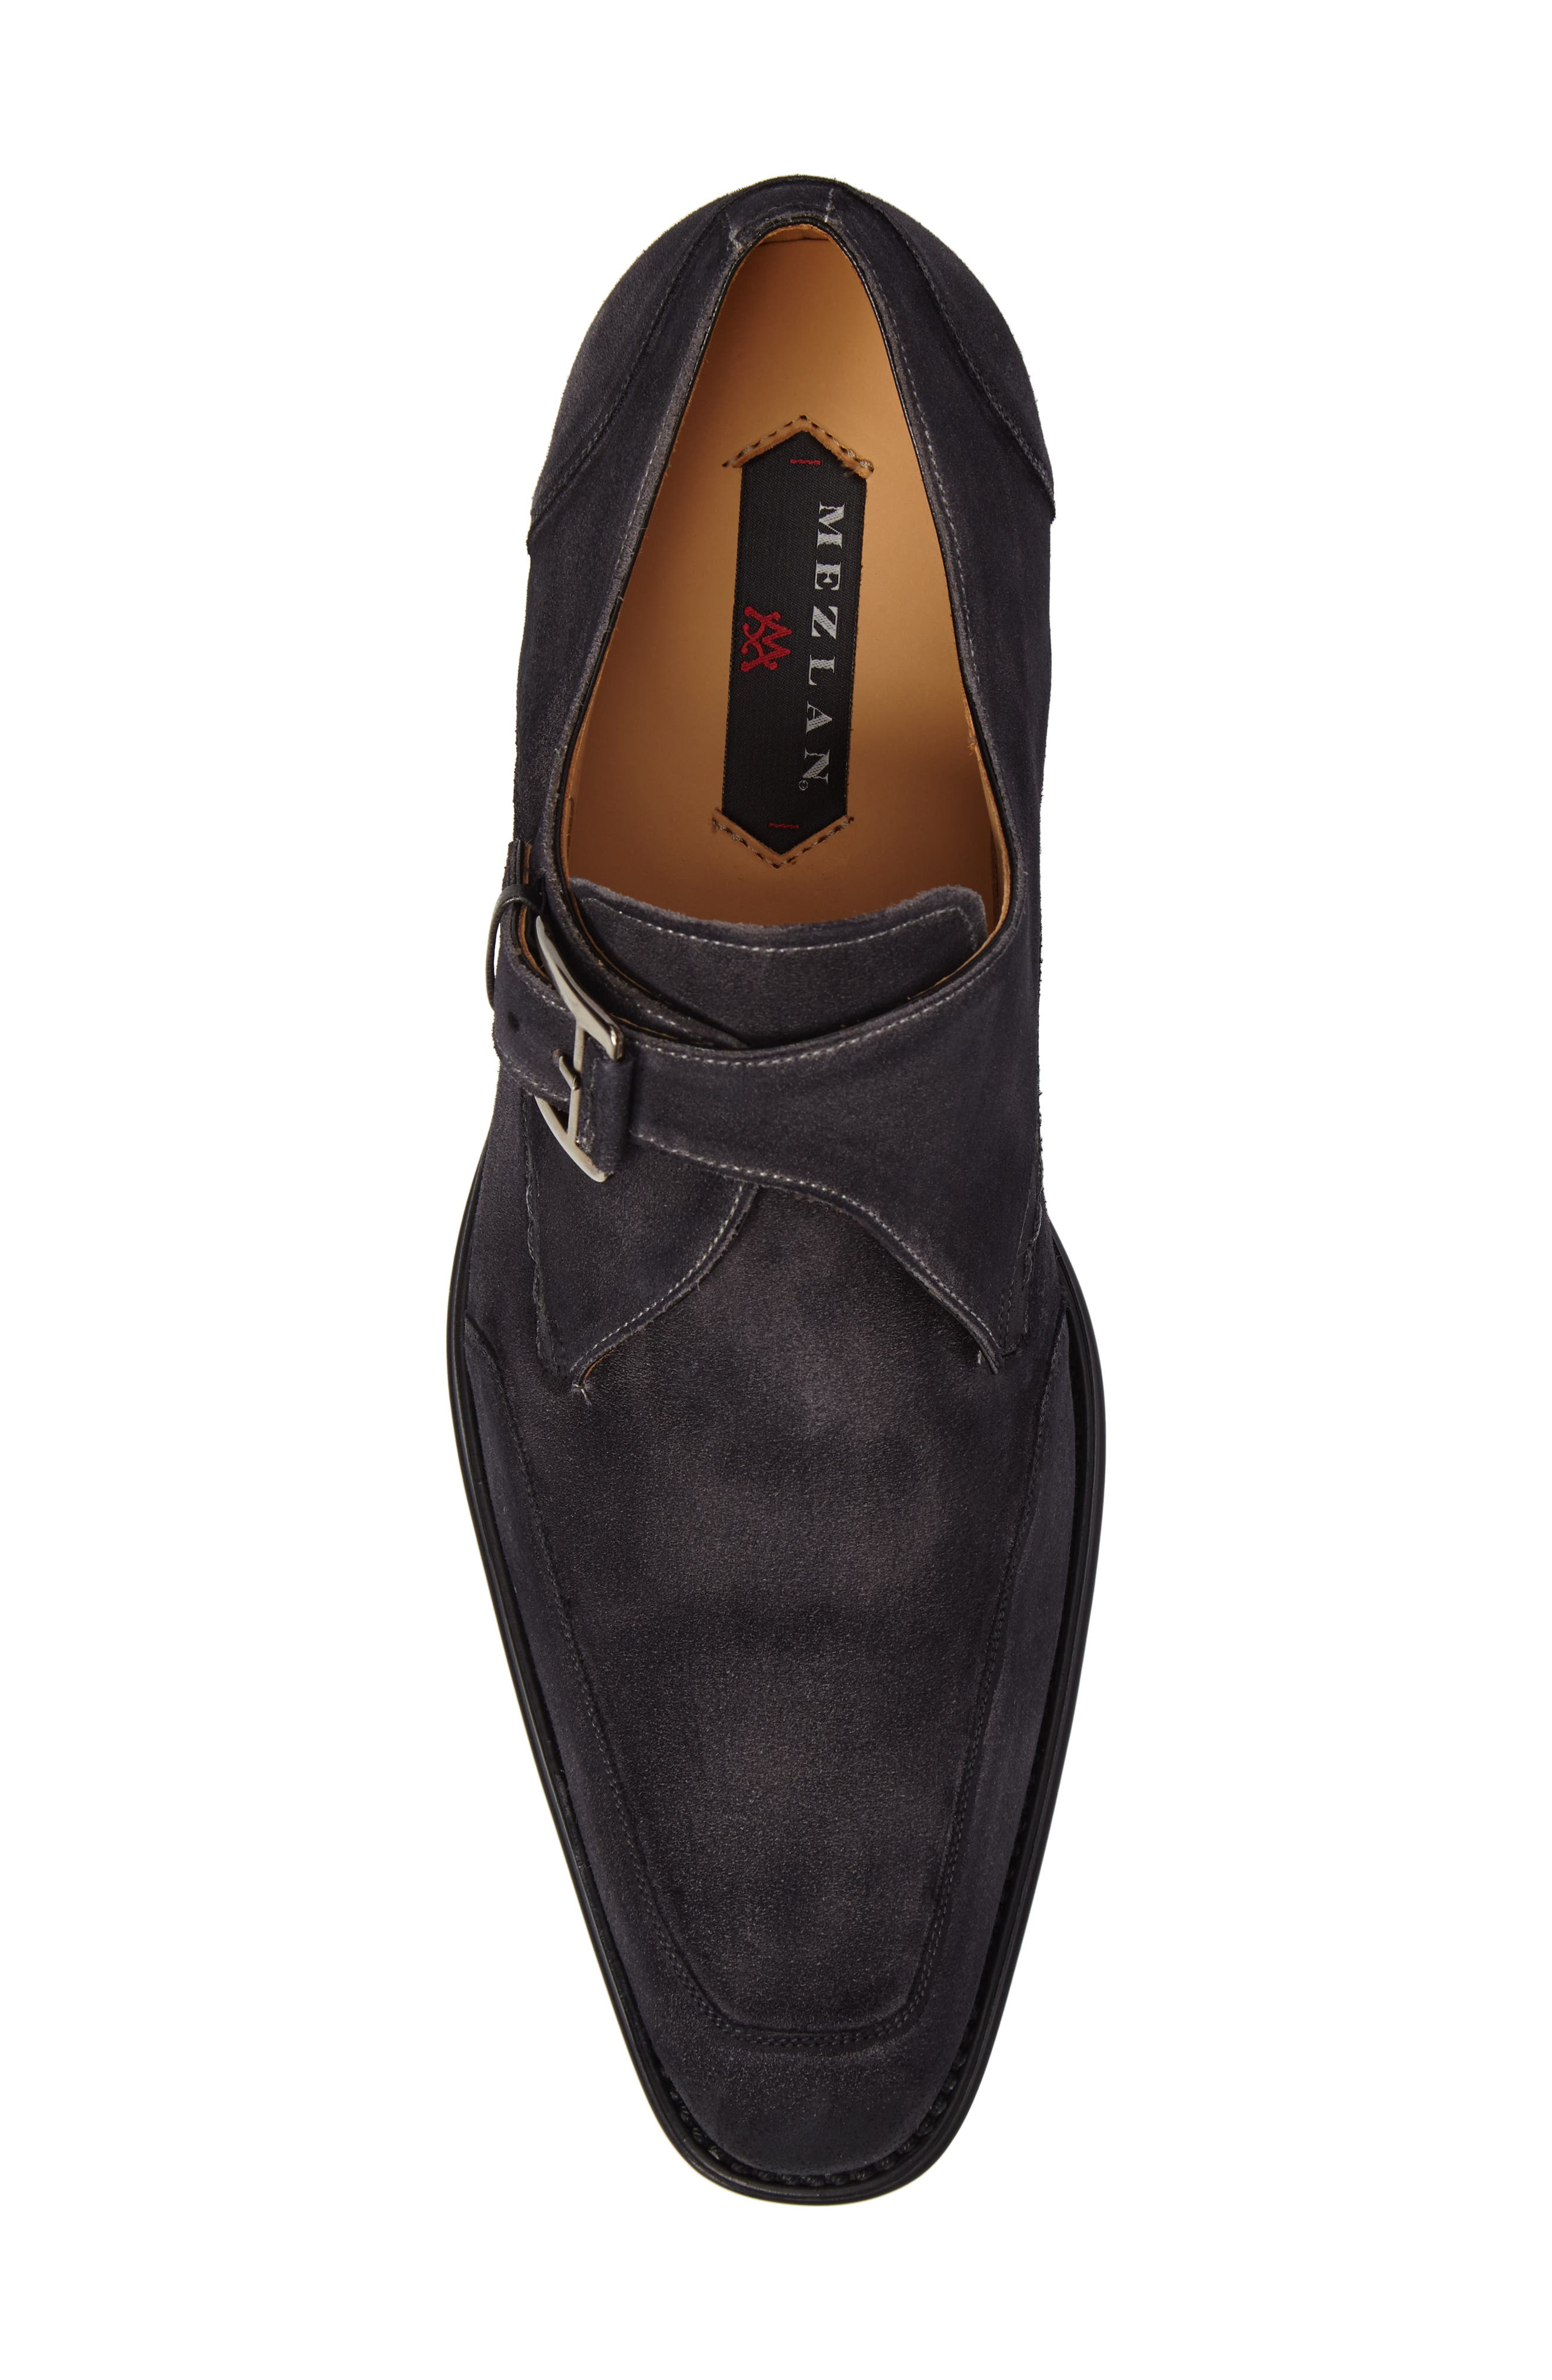 Baza Monk Strap Shoe,                             Alternate thumbnail 5, color,                             020